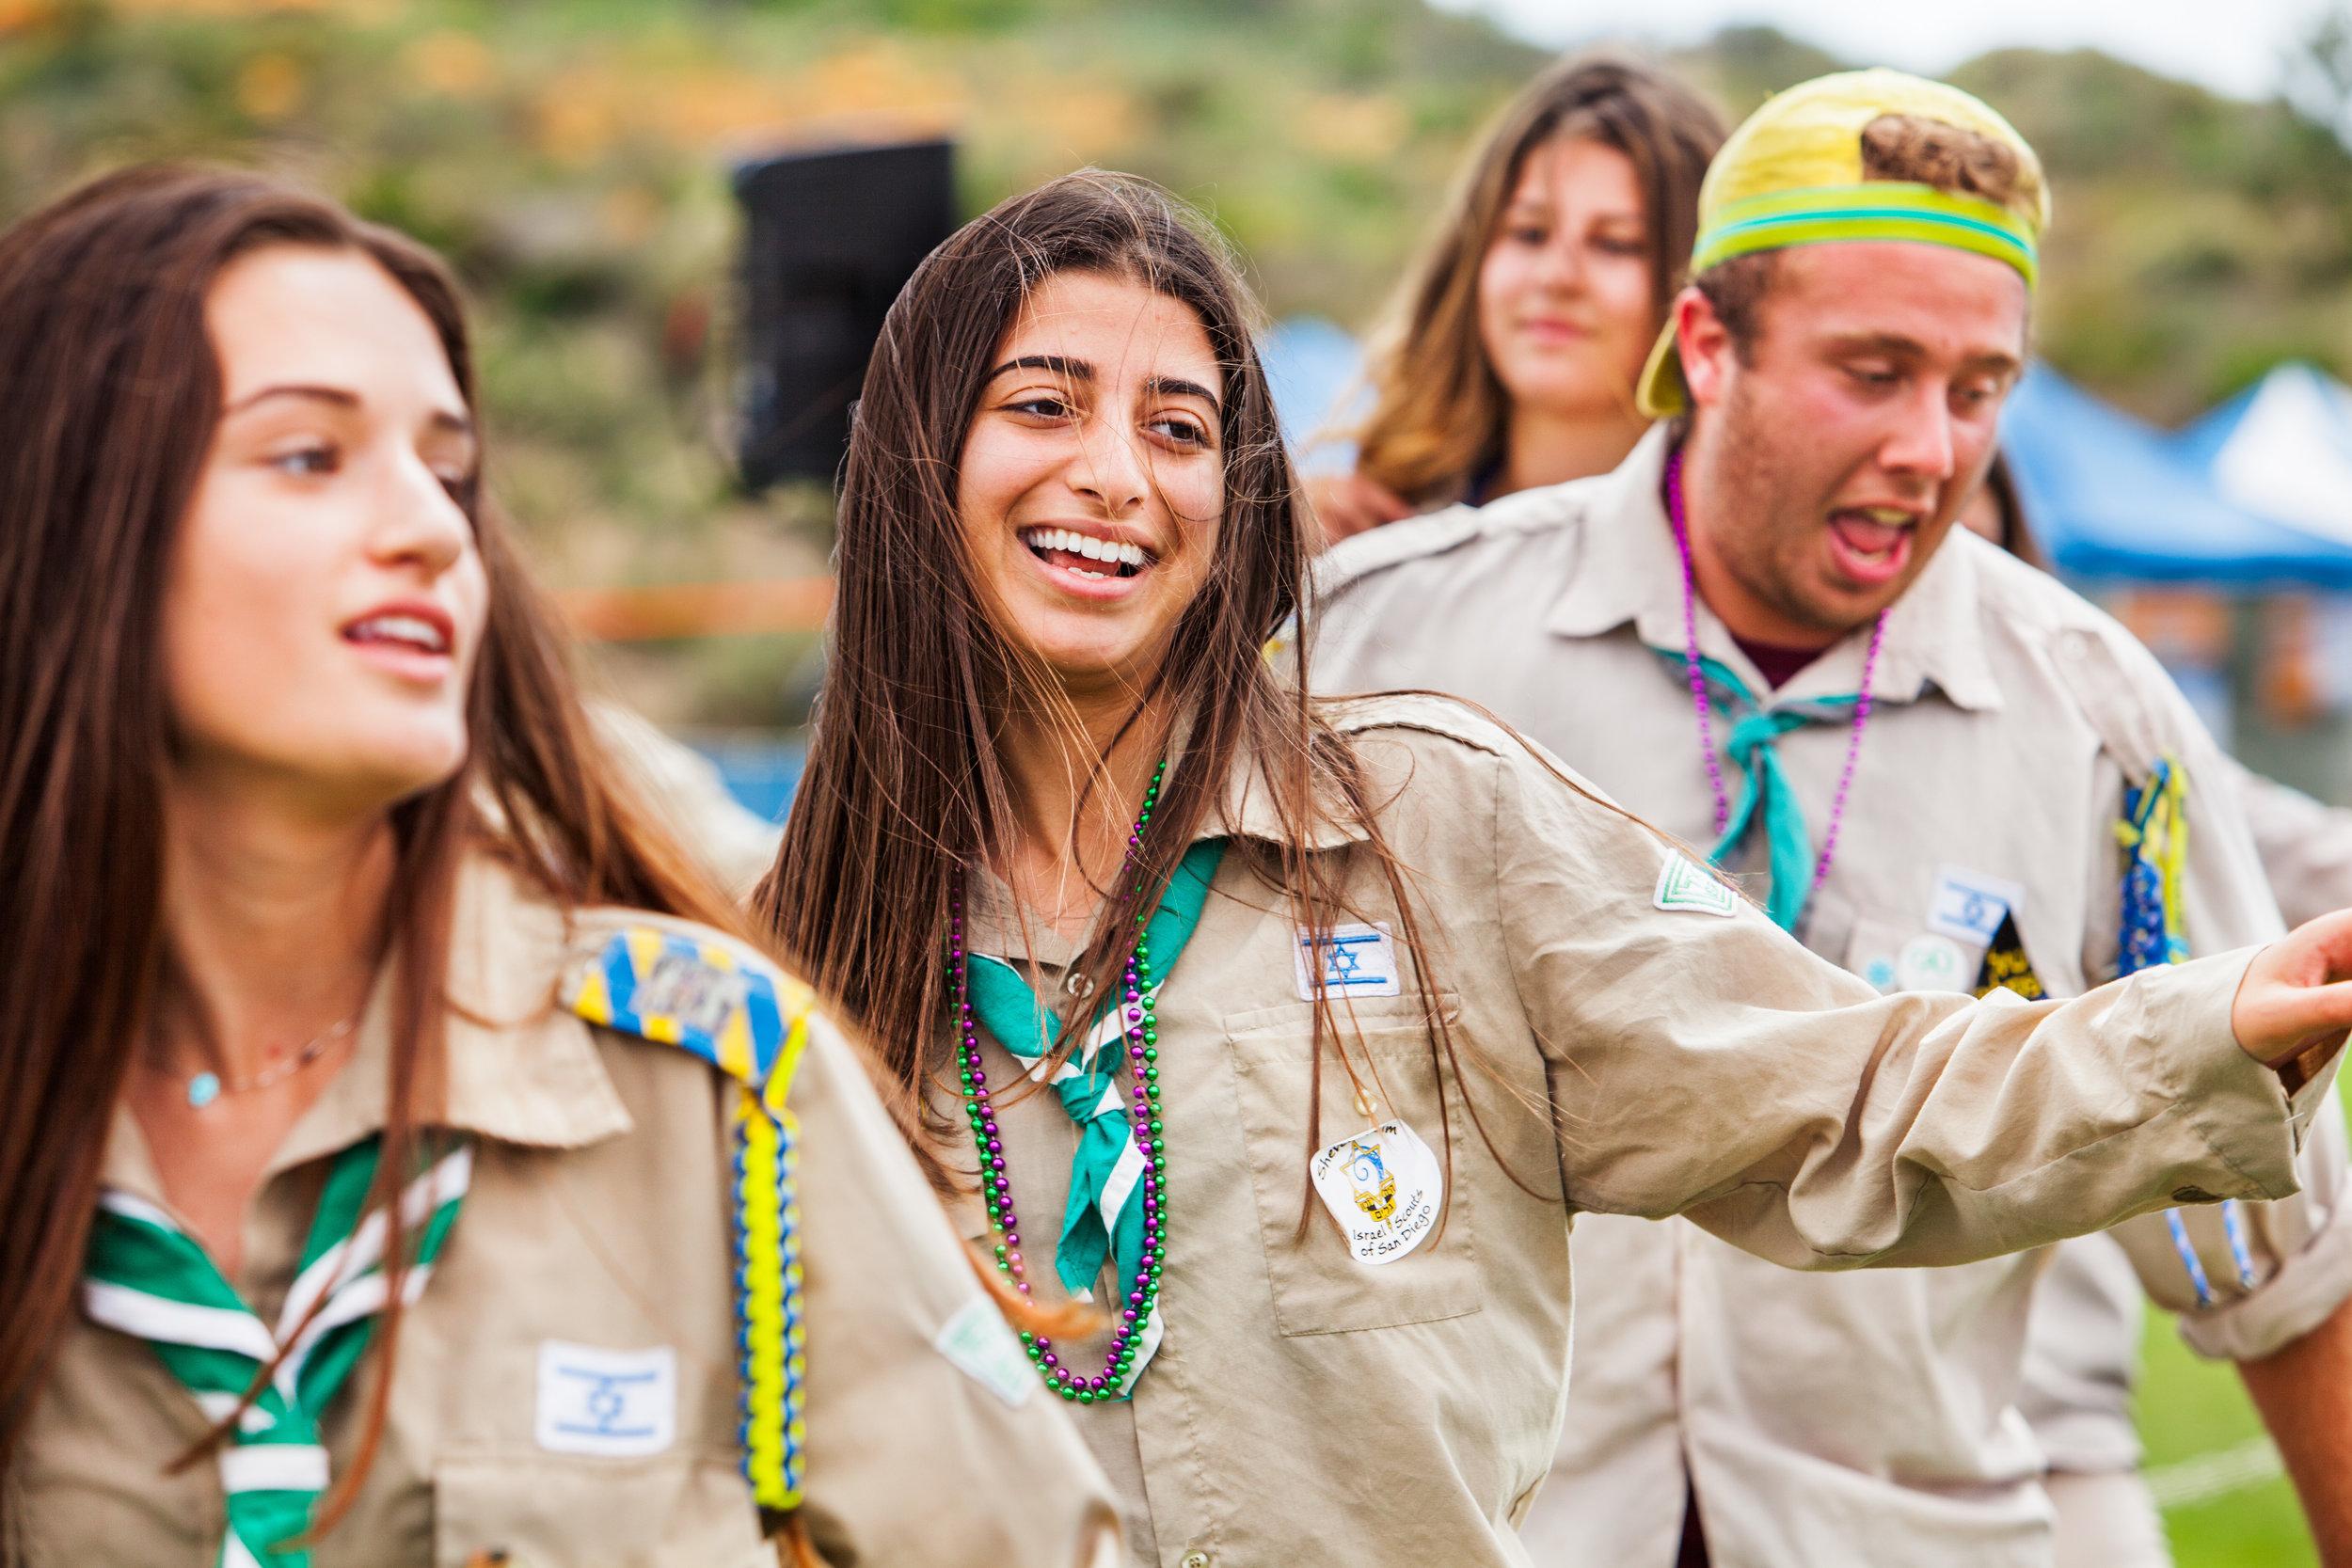 Israeli Scouts Dancing and Smiling.jpg